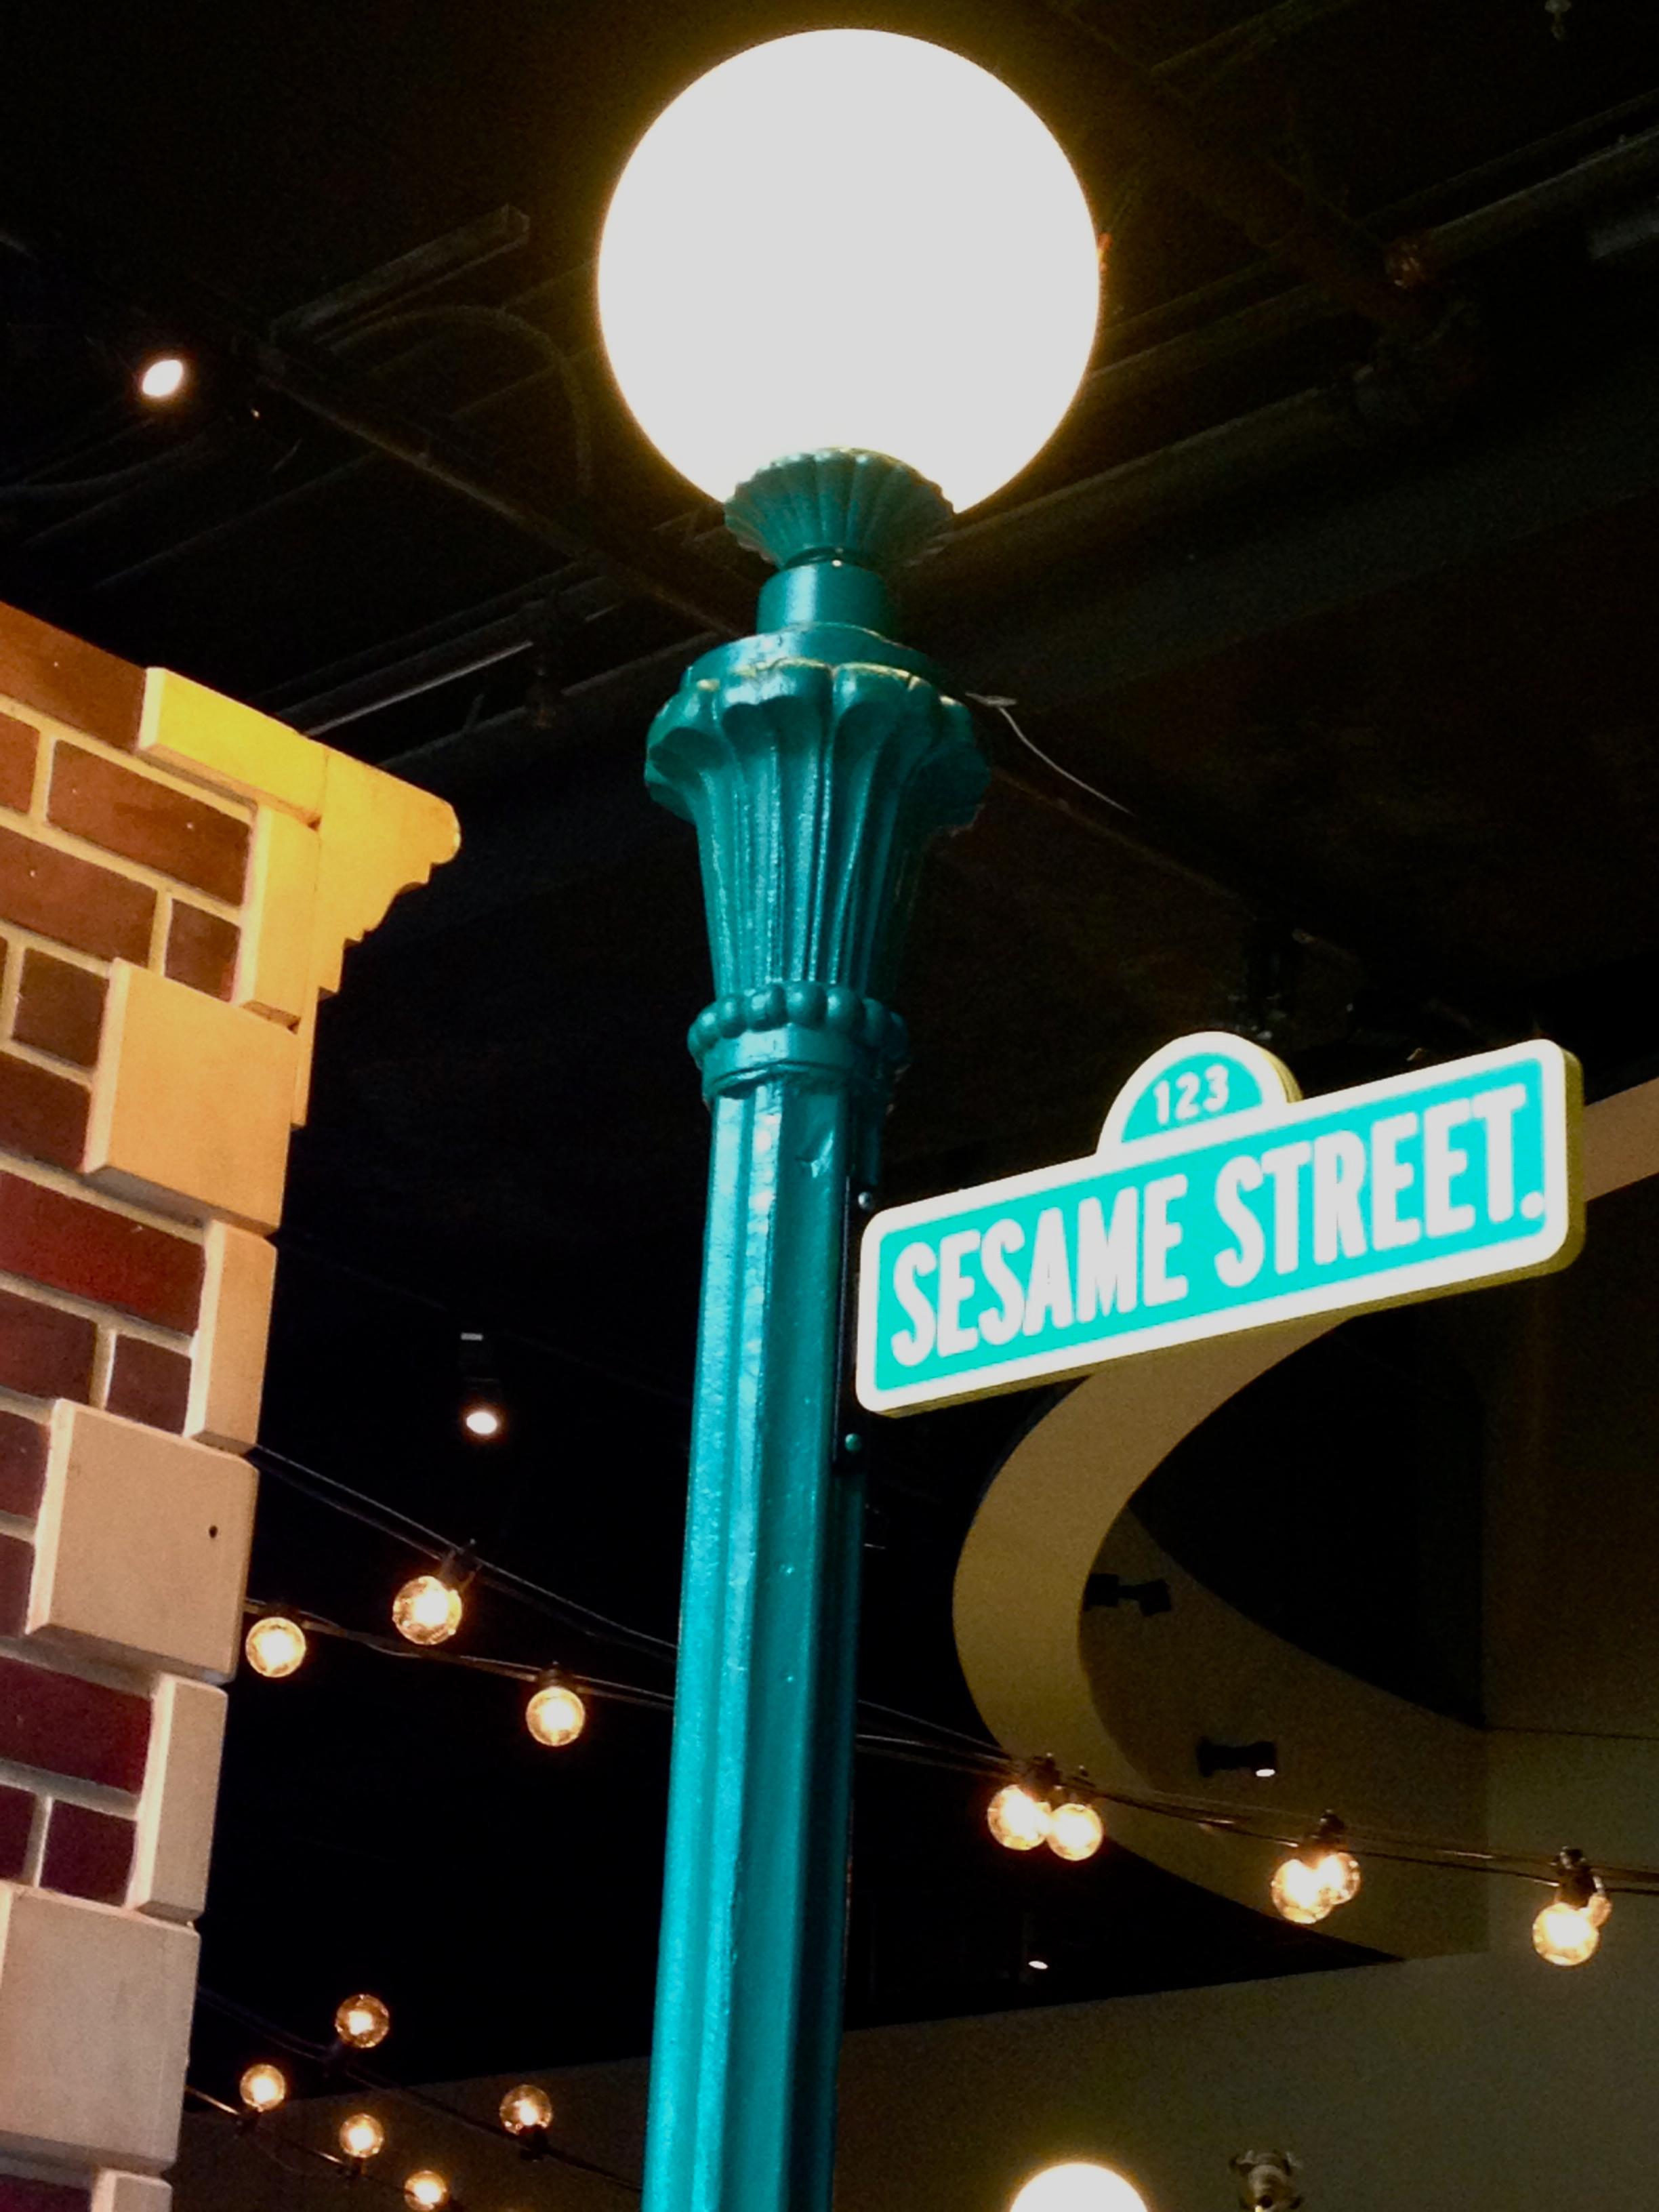 Sesame street kareninhonolulu let there be light aloadofball Image collections